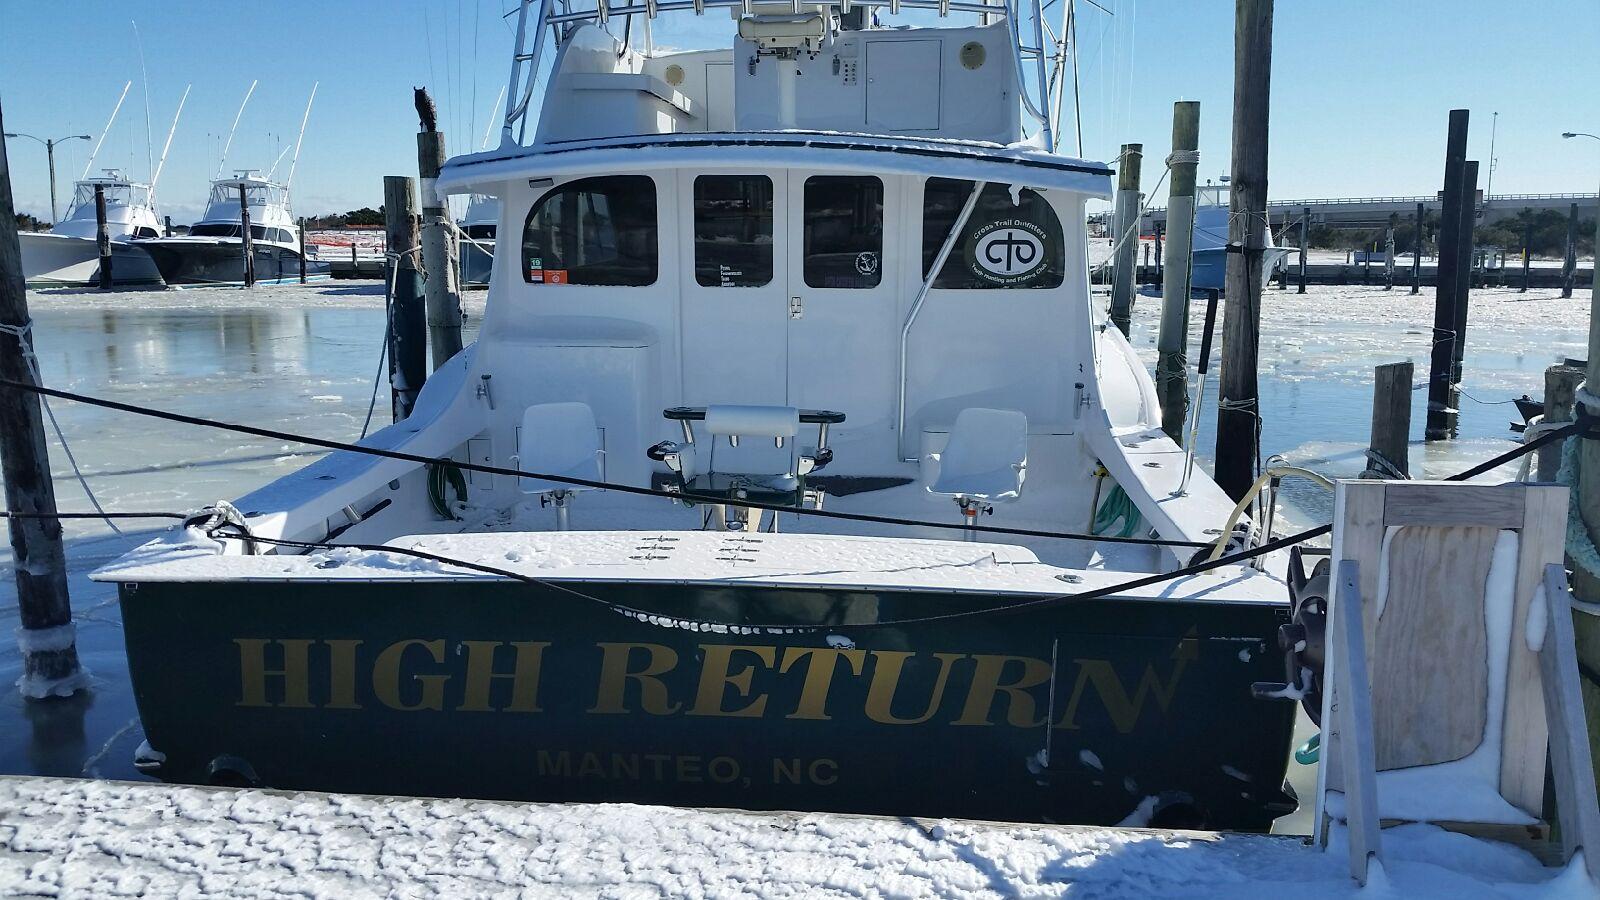 HR Ice Basin Boat - 1.2018.JPG